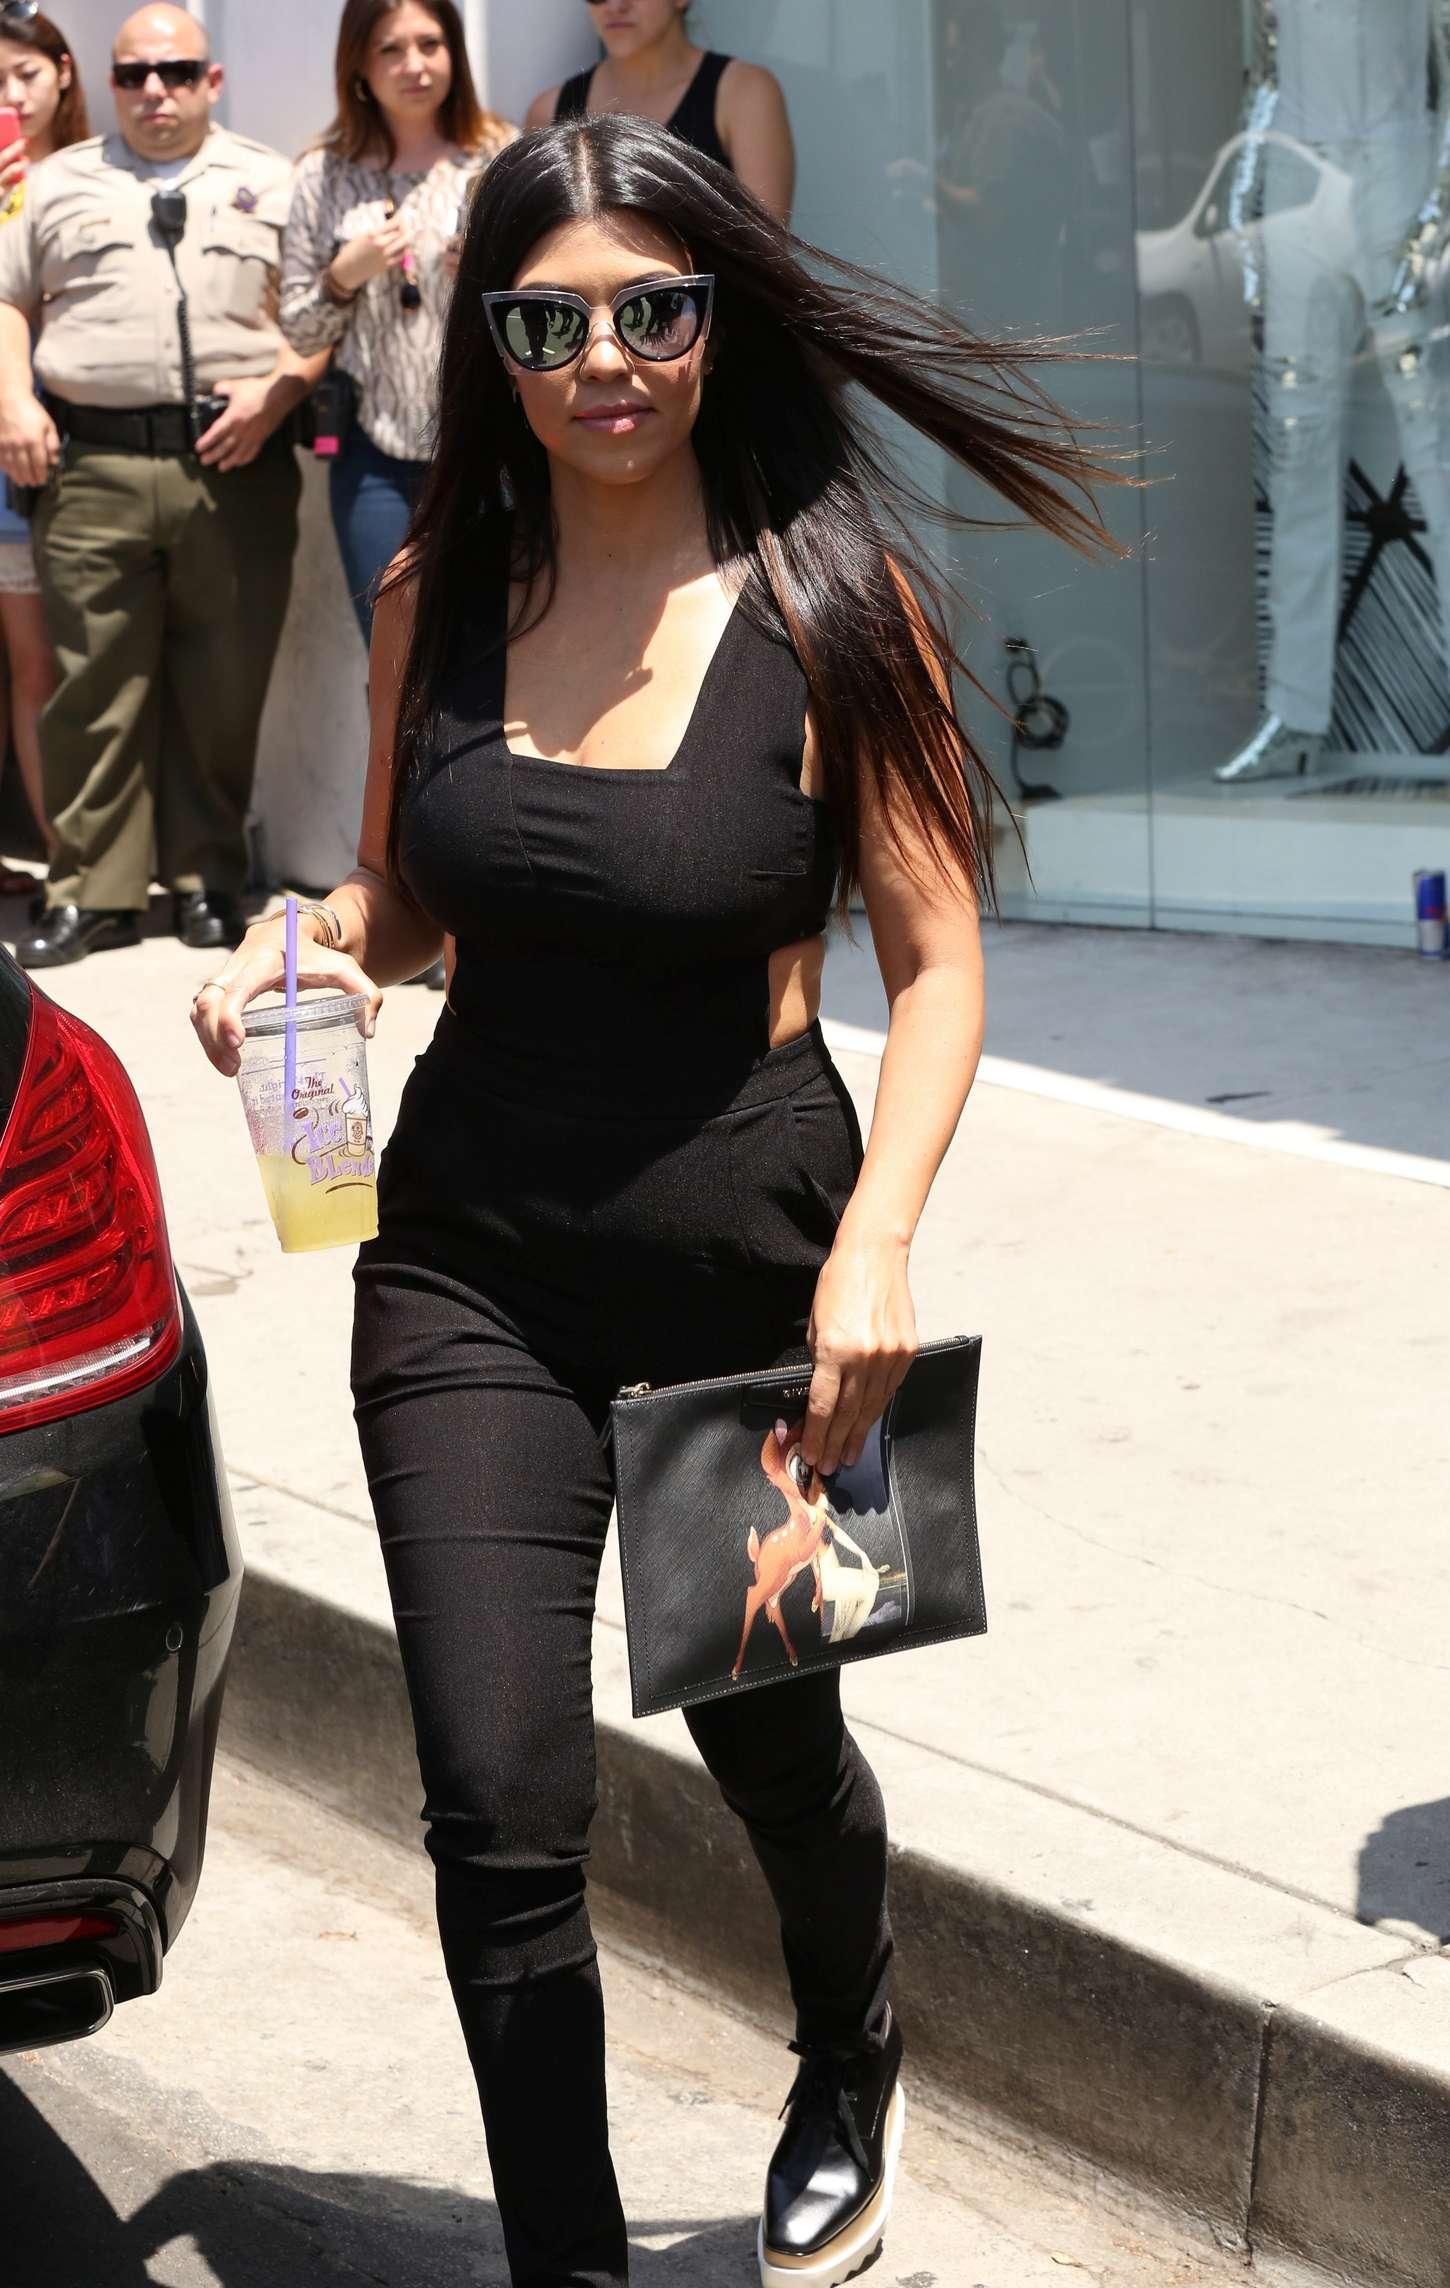 Kourtney Kardashian 2015 : Kourtney Kardashian Booty in Pants -16